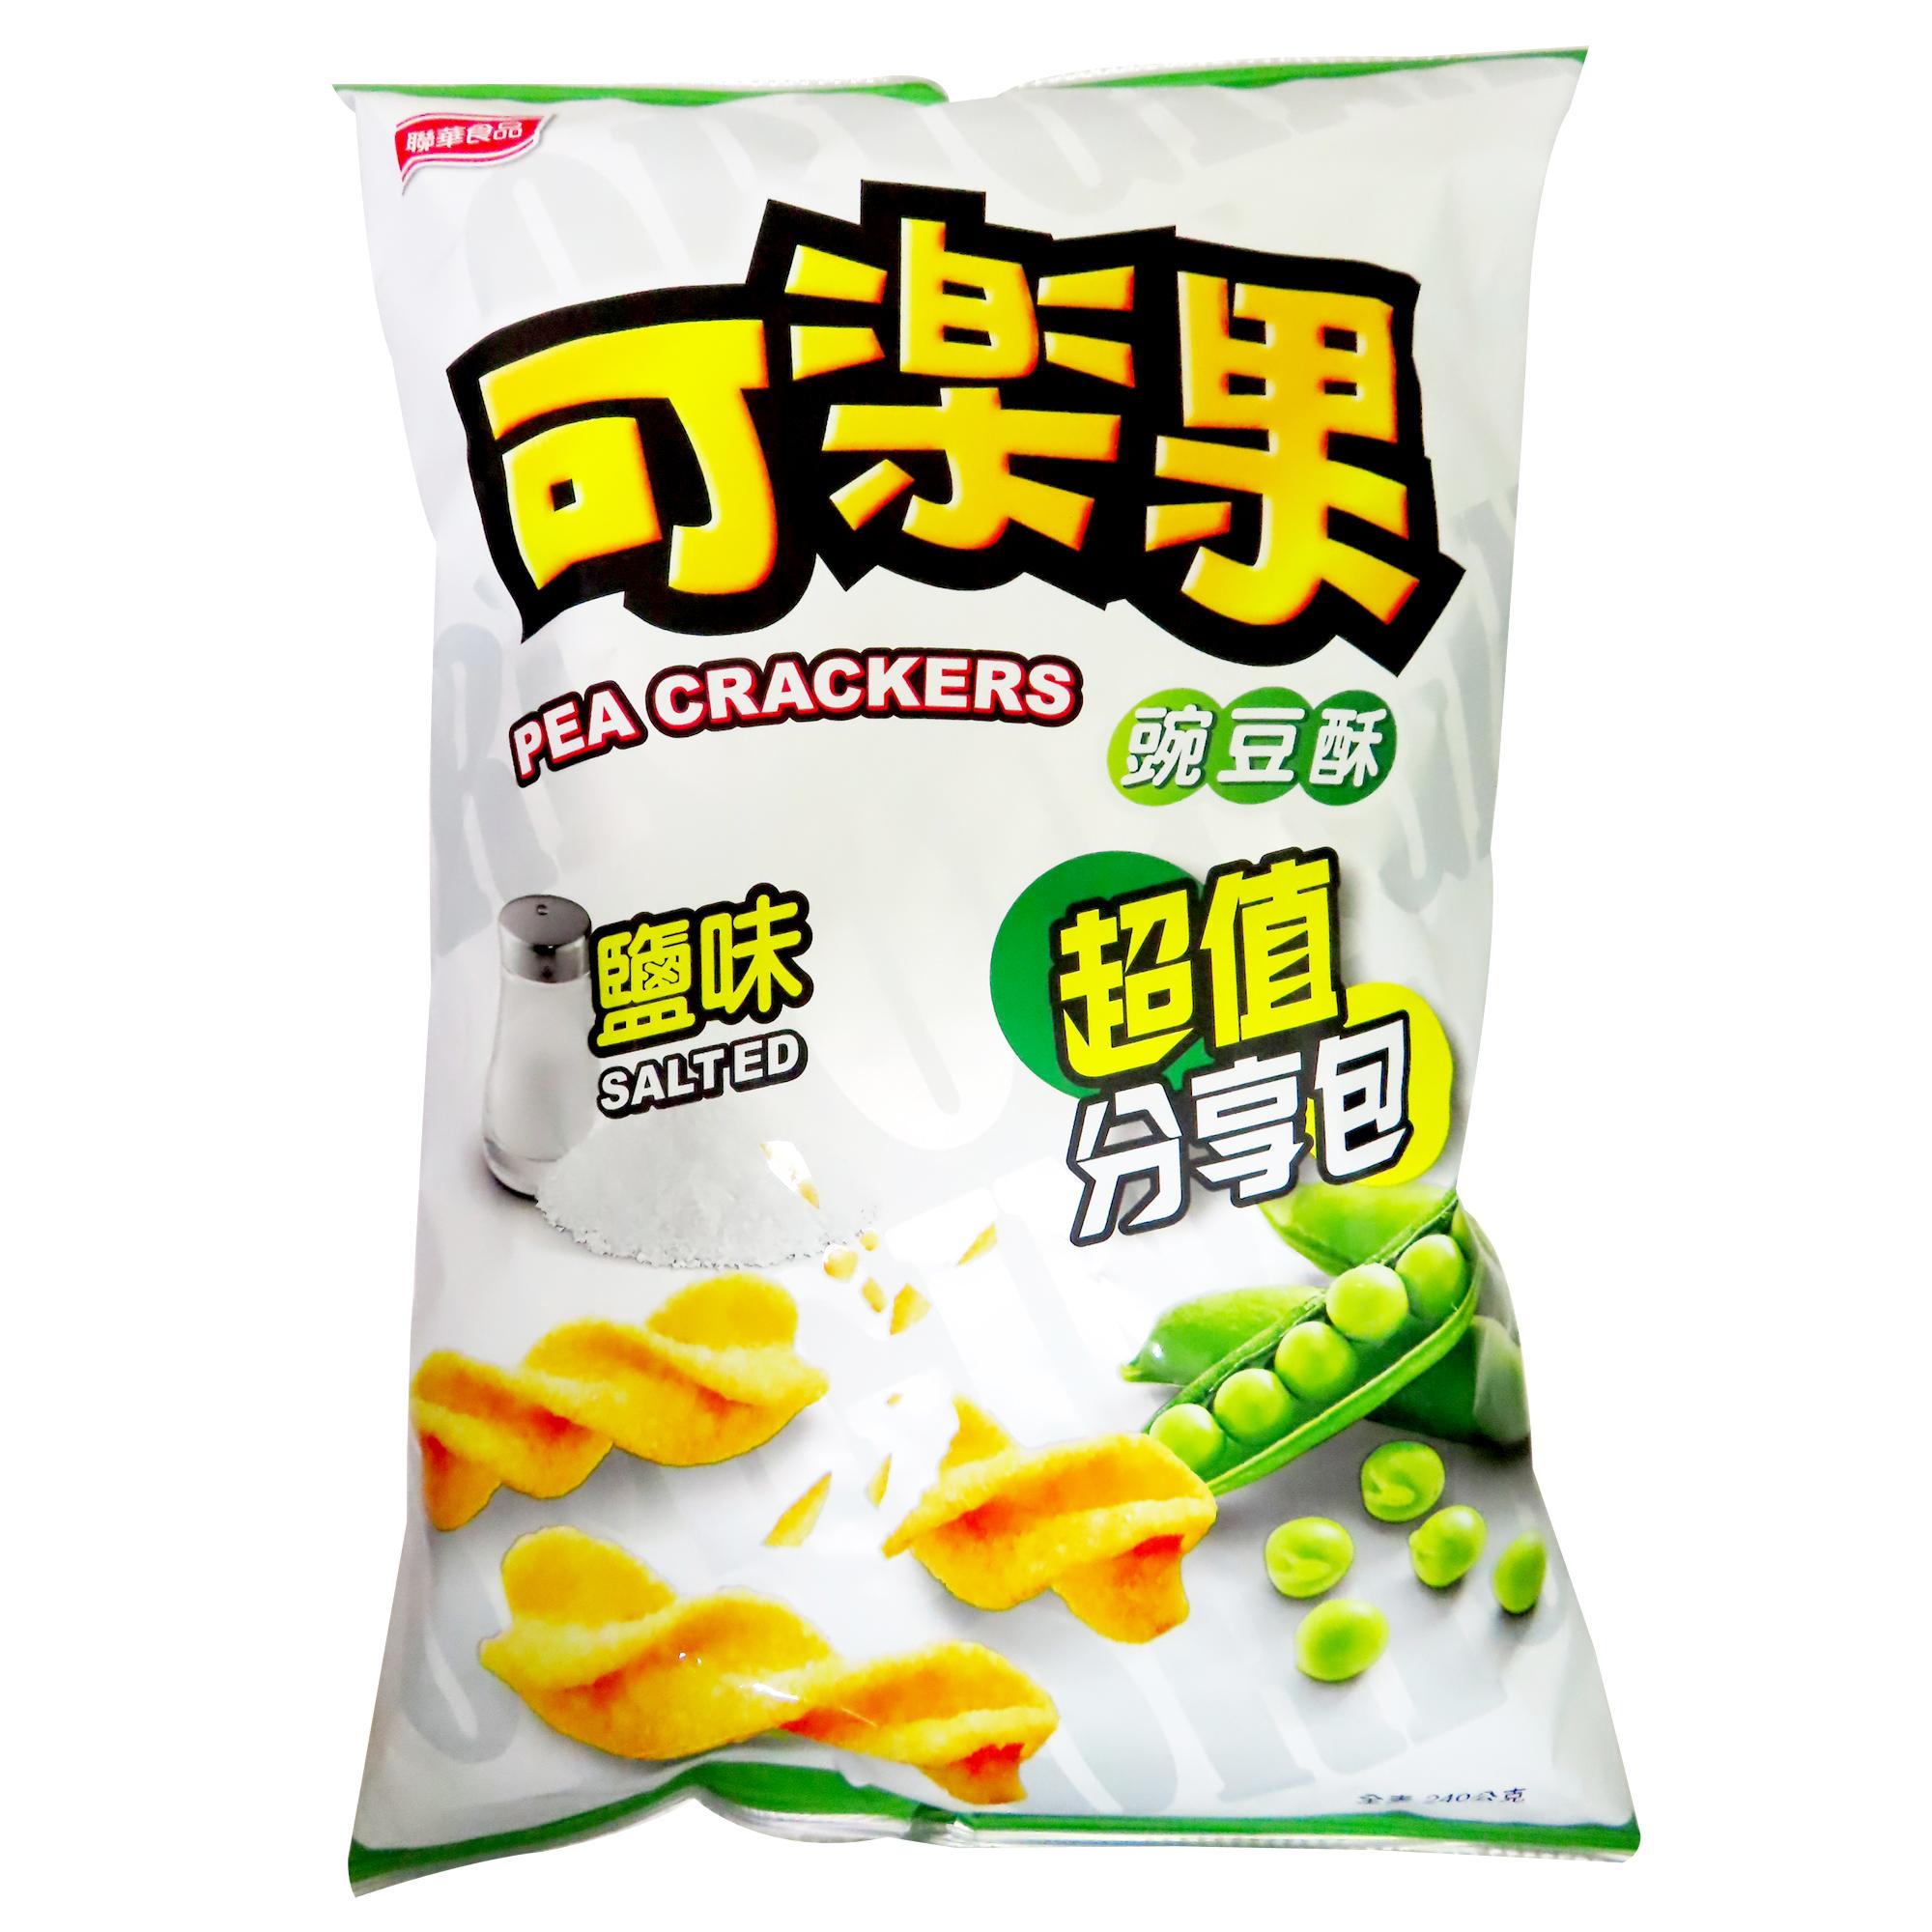 Image Salted Pea Crackers 联华 - 盐味可乐果(大 / 分享包) 240grams